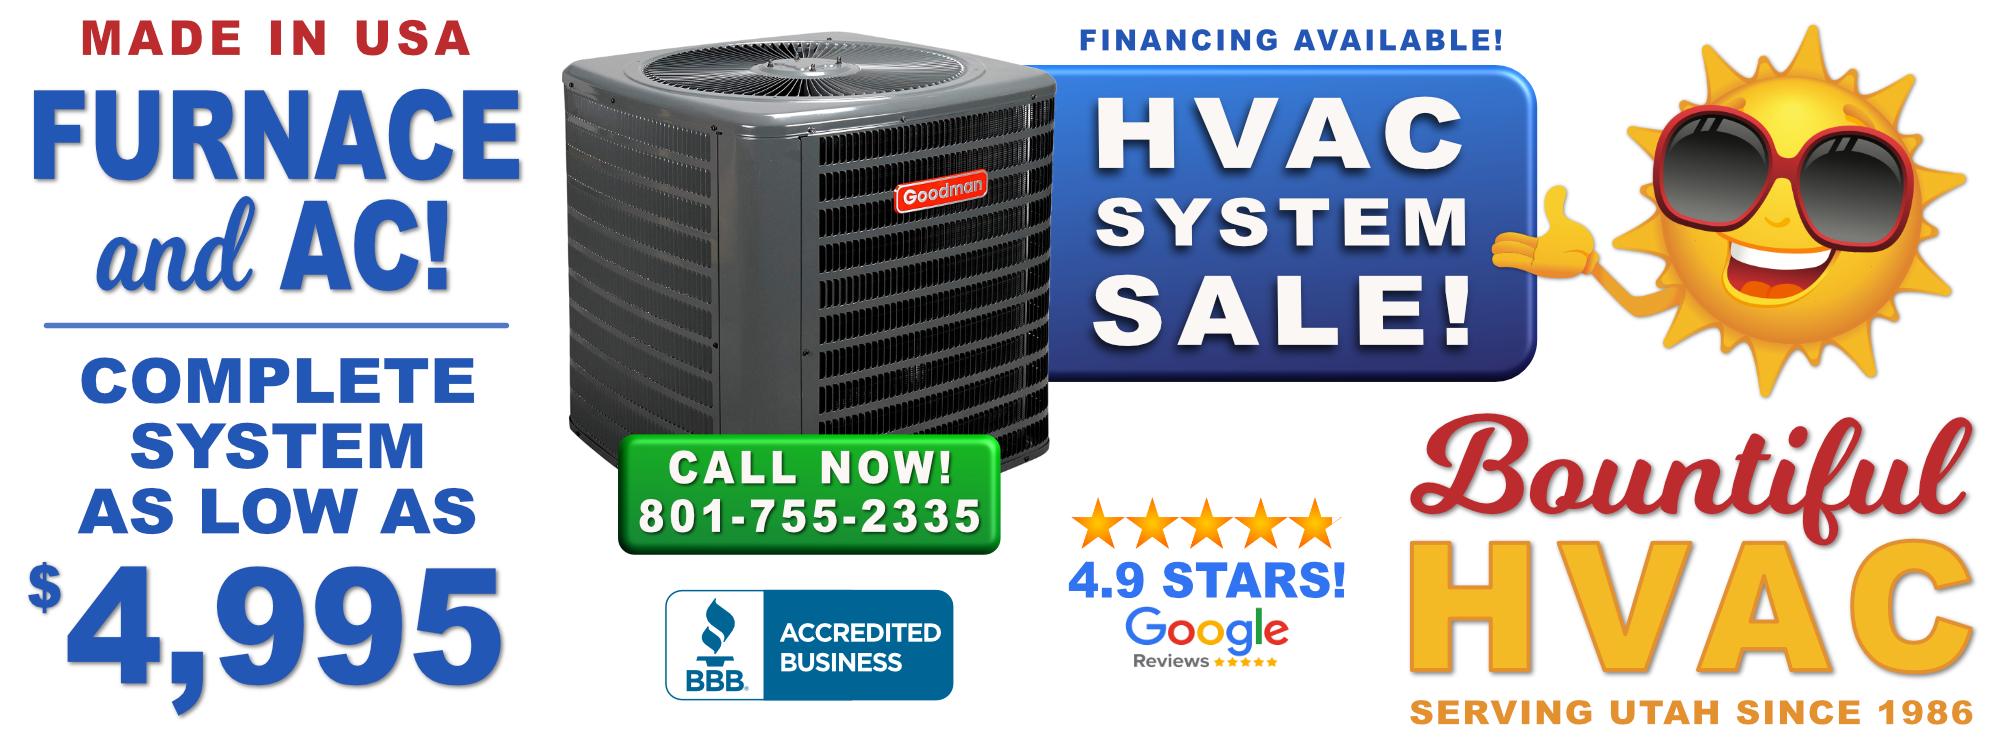 Bountiful HVAC System Sale